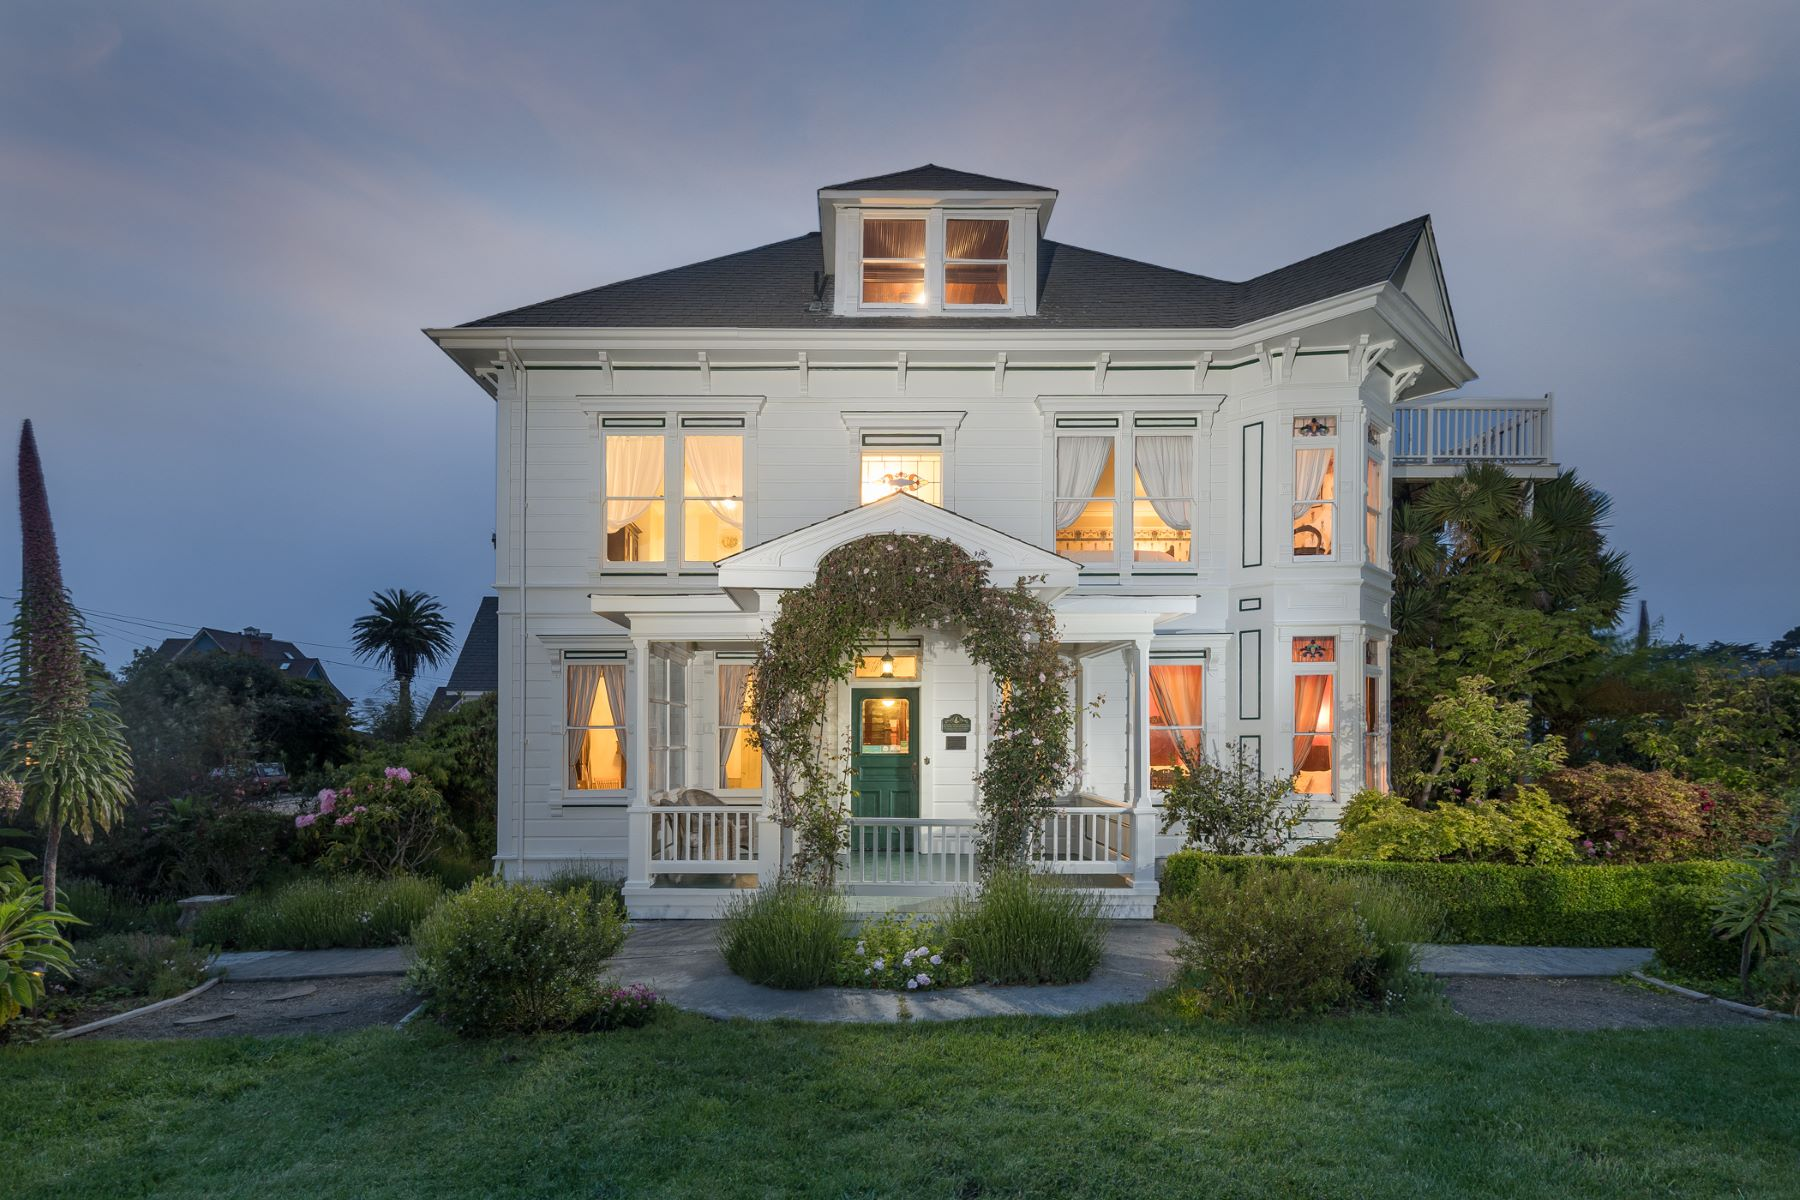 Single Family Homes for Sale at Historic Weller House Estate! 524 Stewart Street Fort Bragg, California 95437 United States